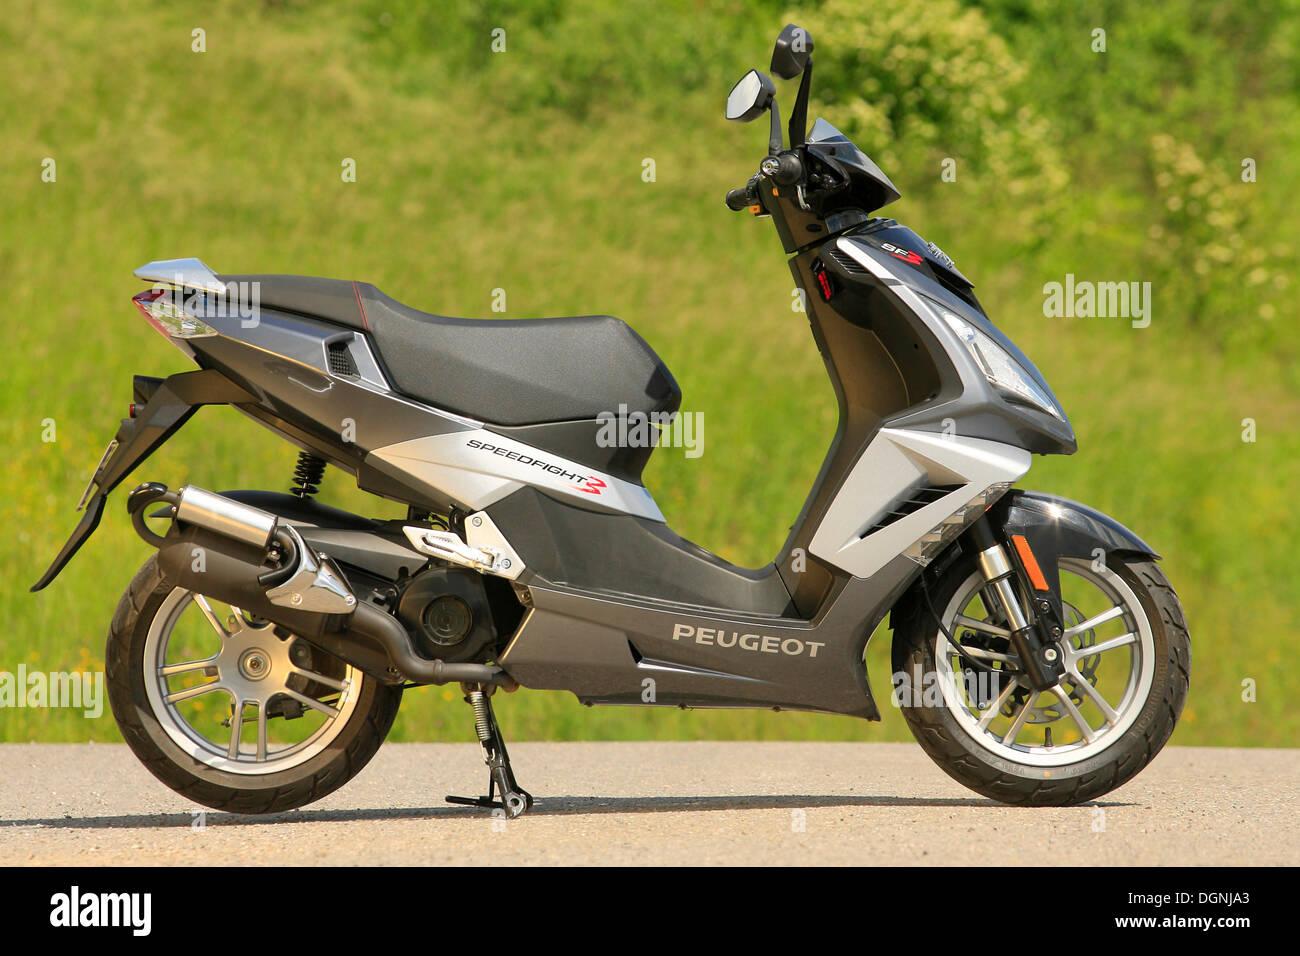 Peugeot Speedfight 3 scooter - Stock Image